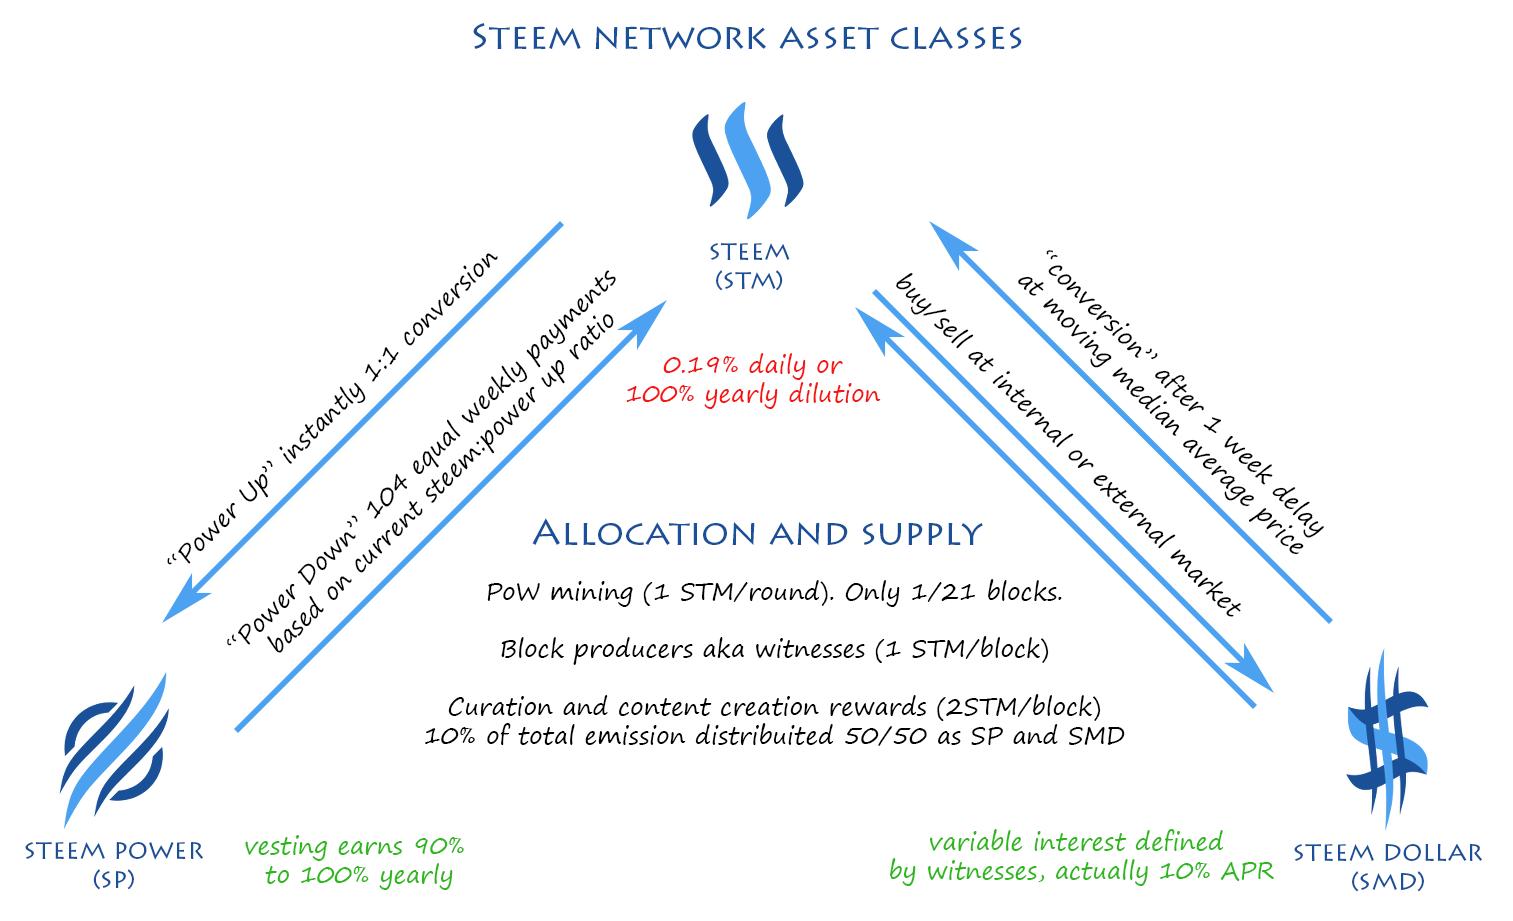 Steem network asset classes